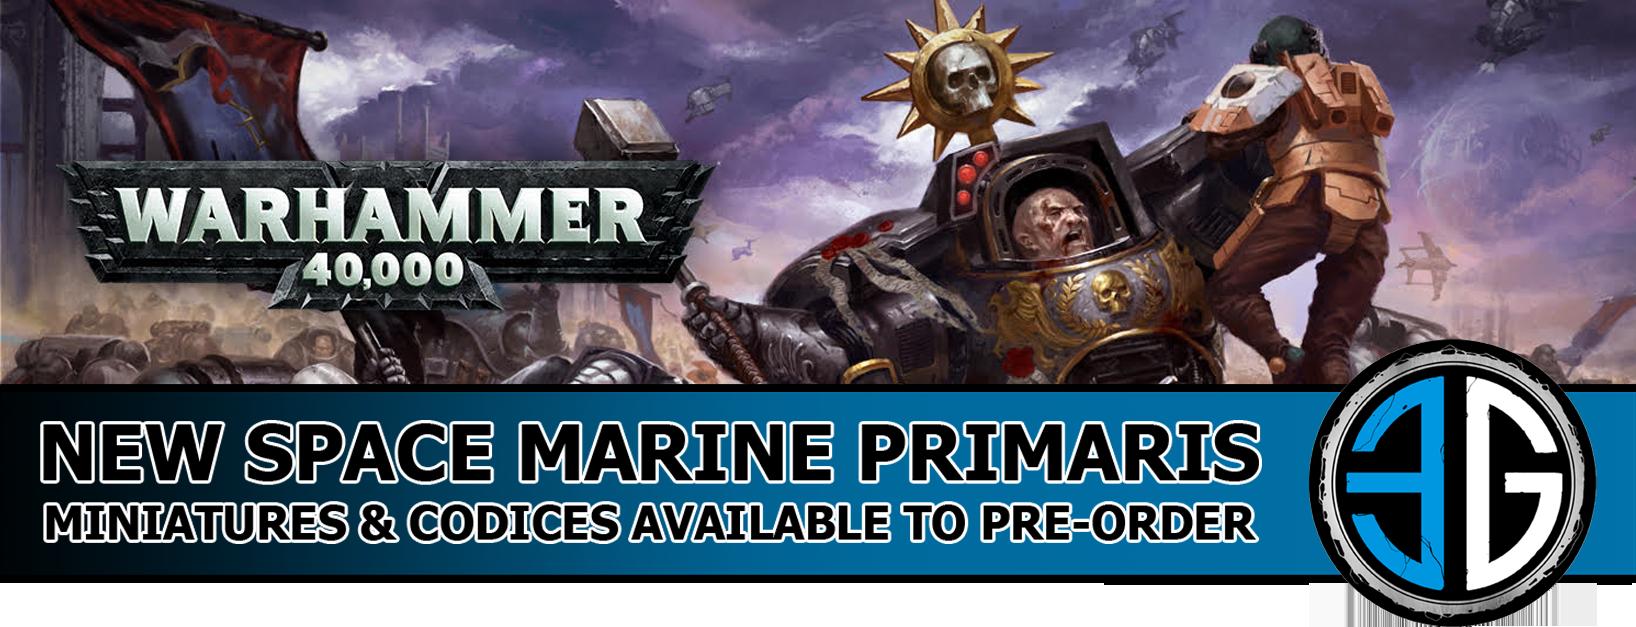 space marine primarys